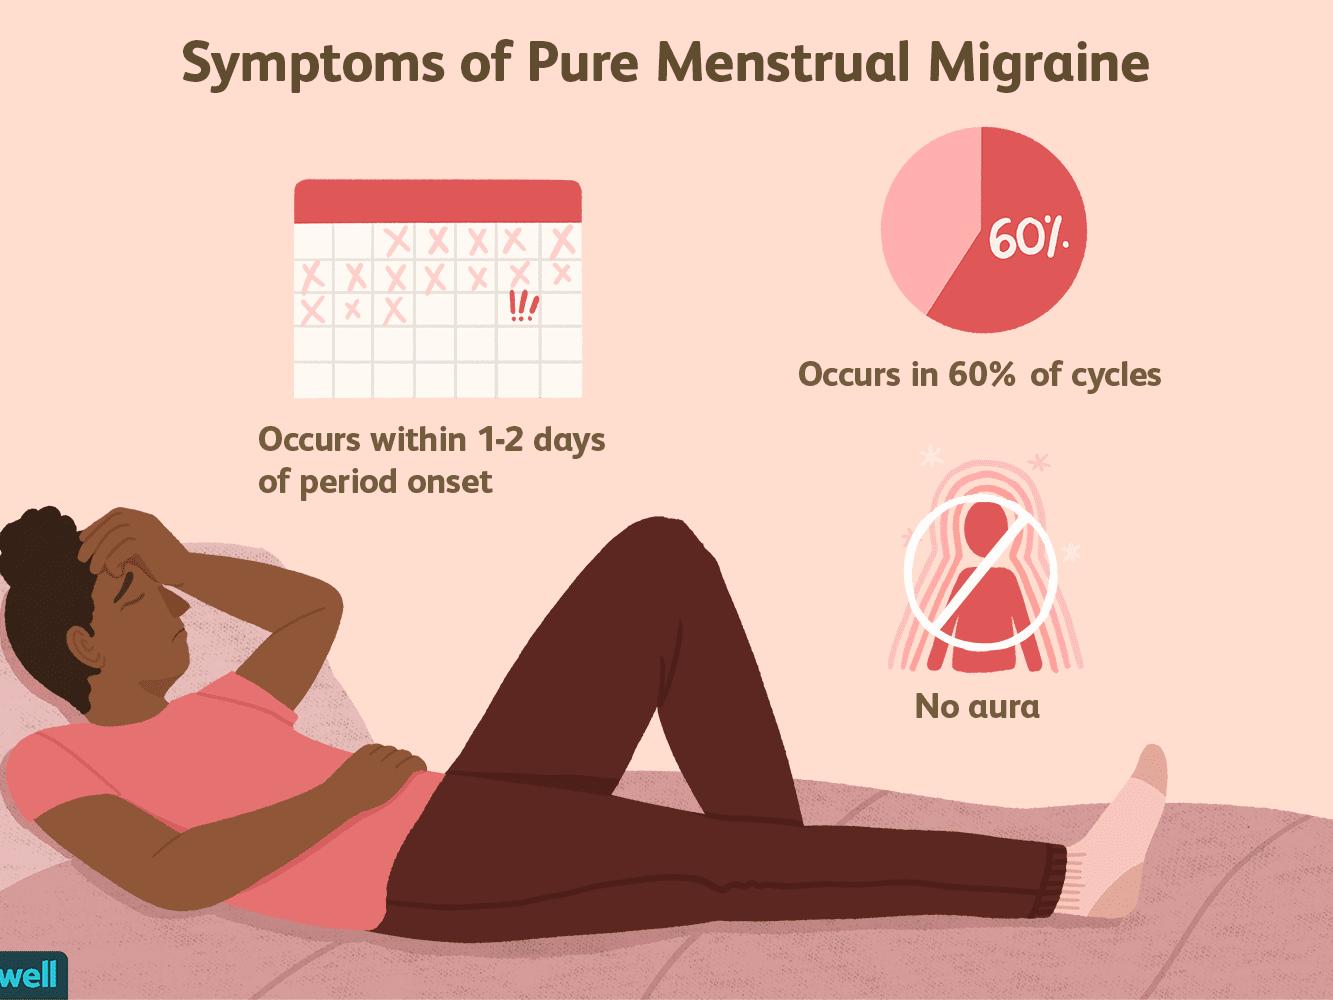 Menstrual Migraines: Symptoms, Causes, Diagnosis, and Treatments